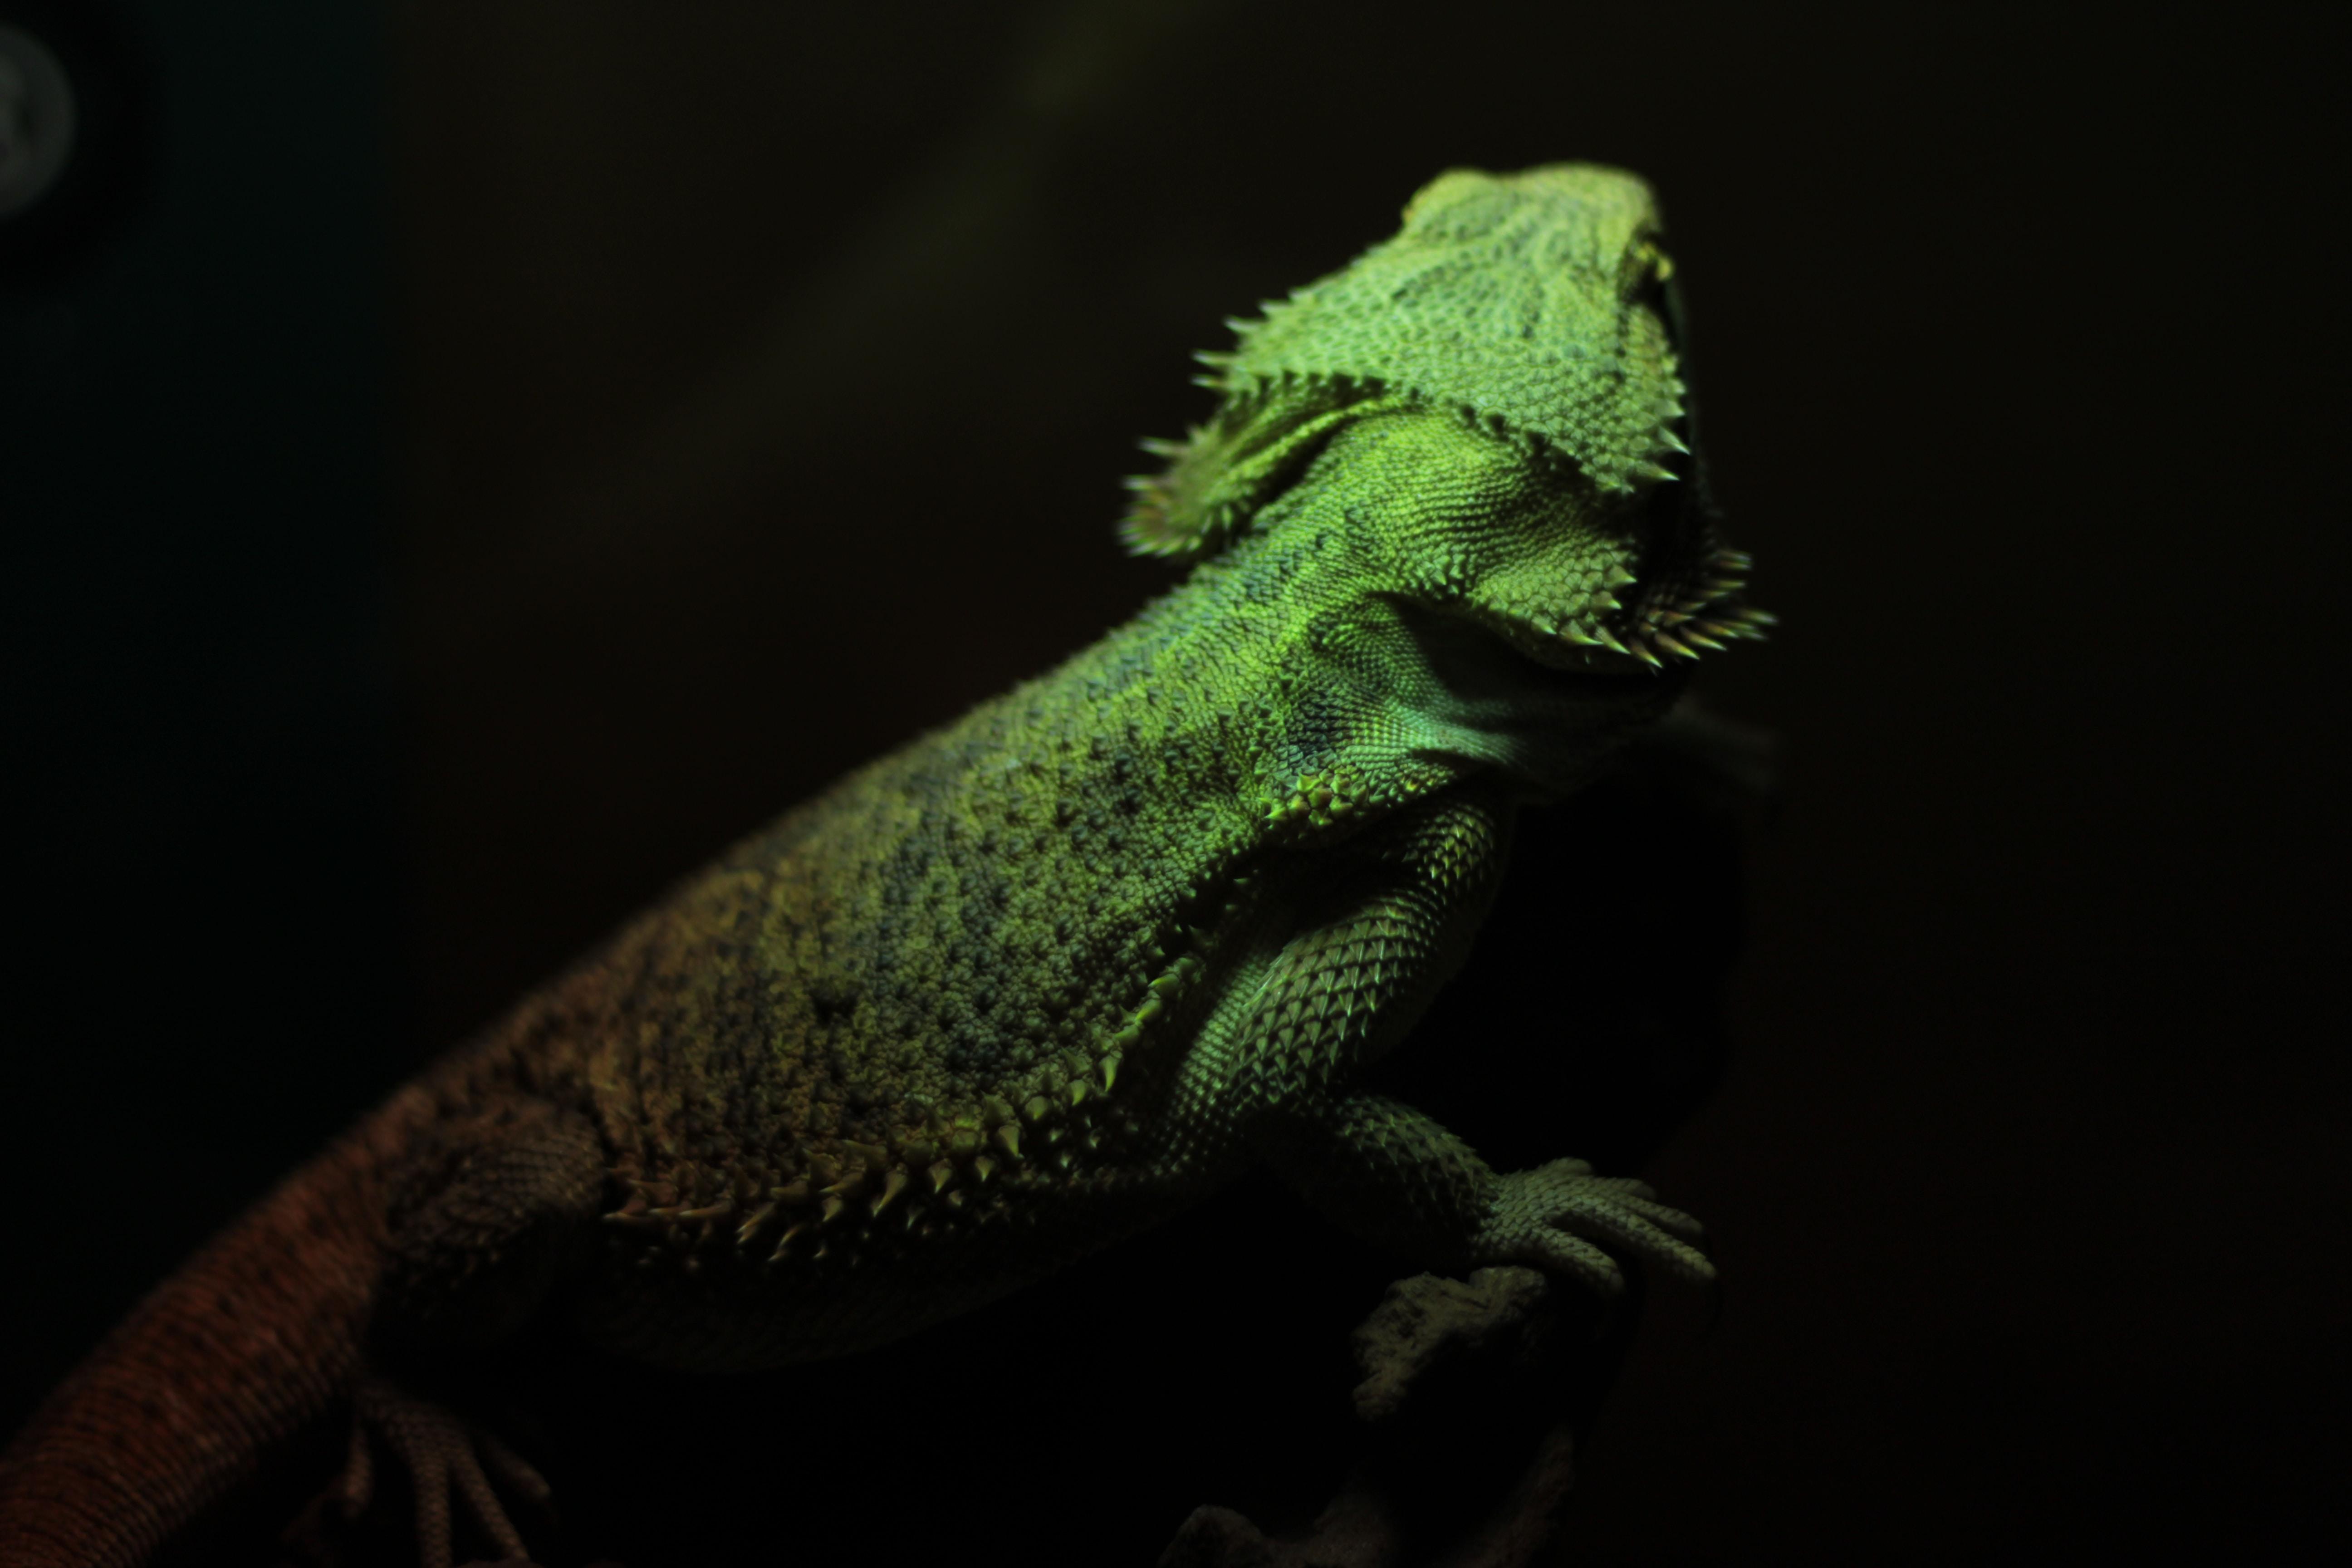 green bearded dragon shallow focus photography